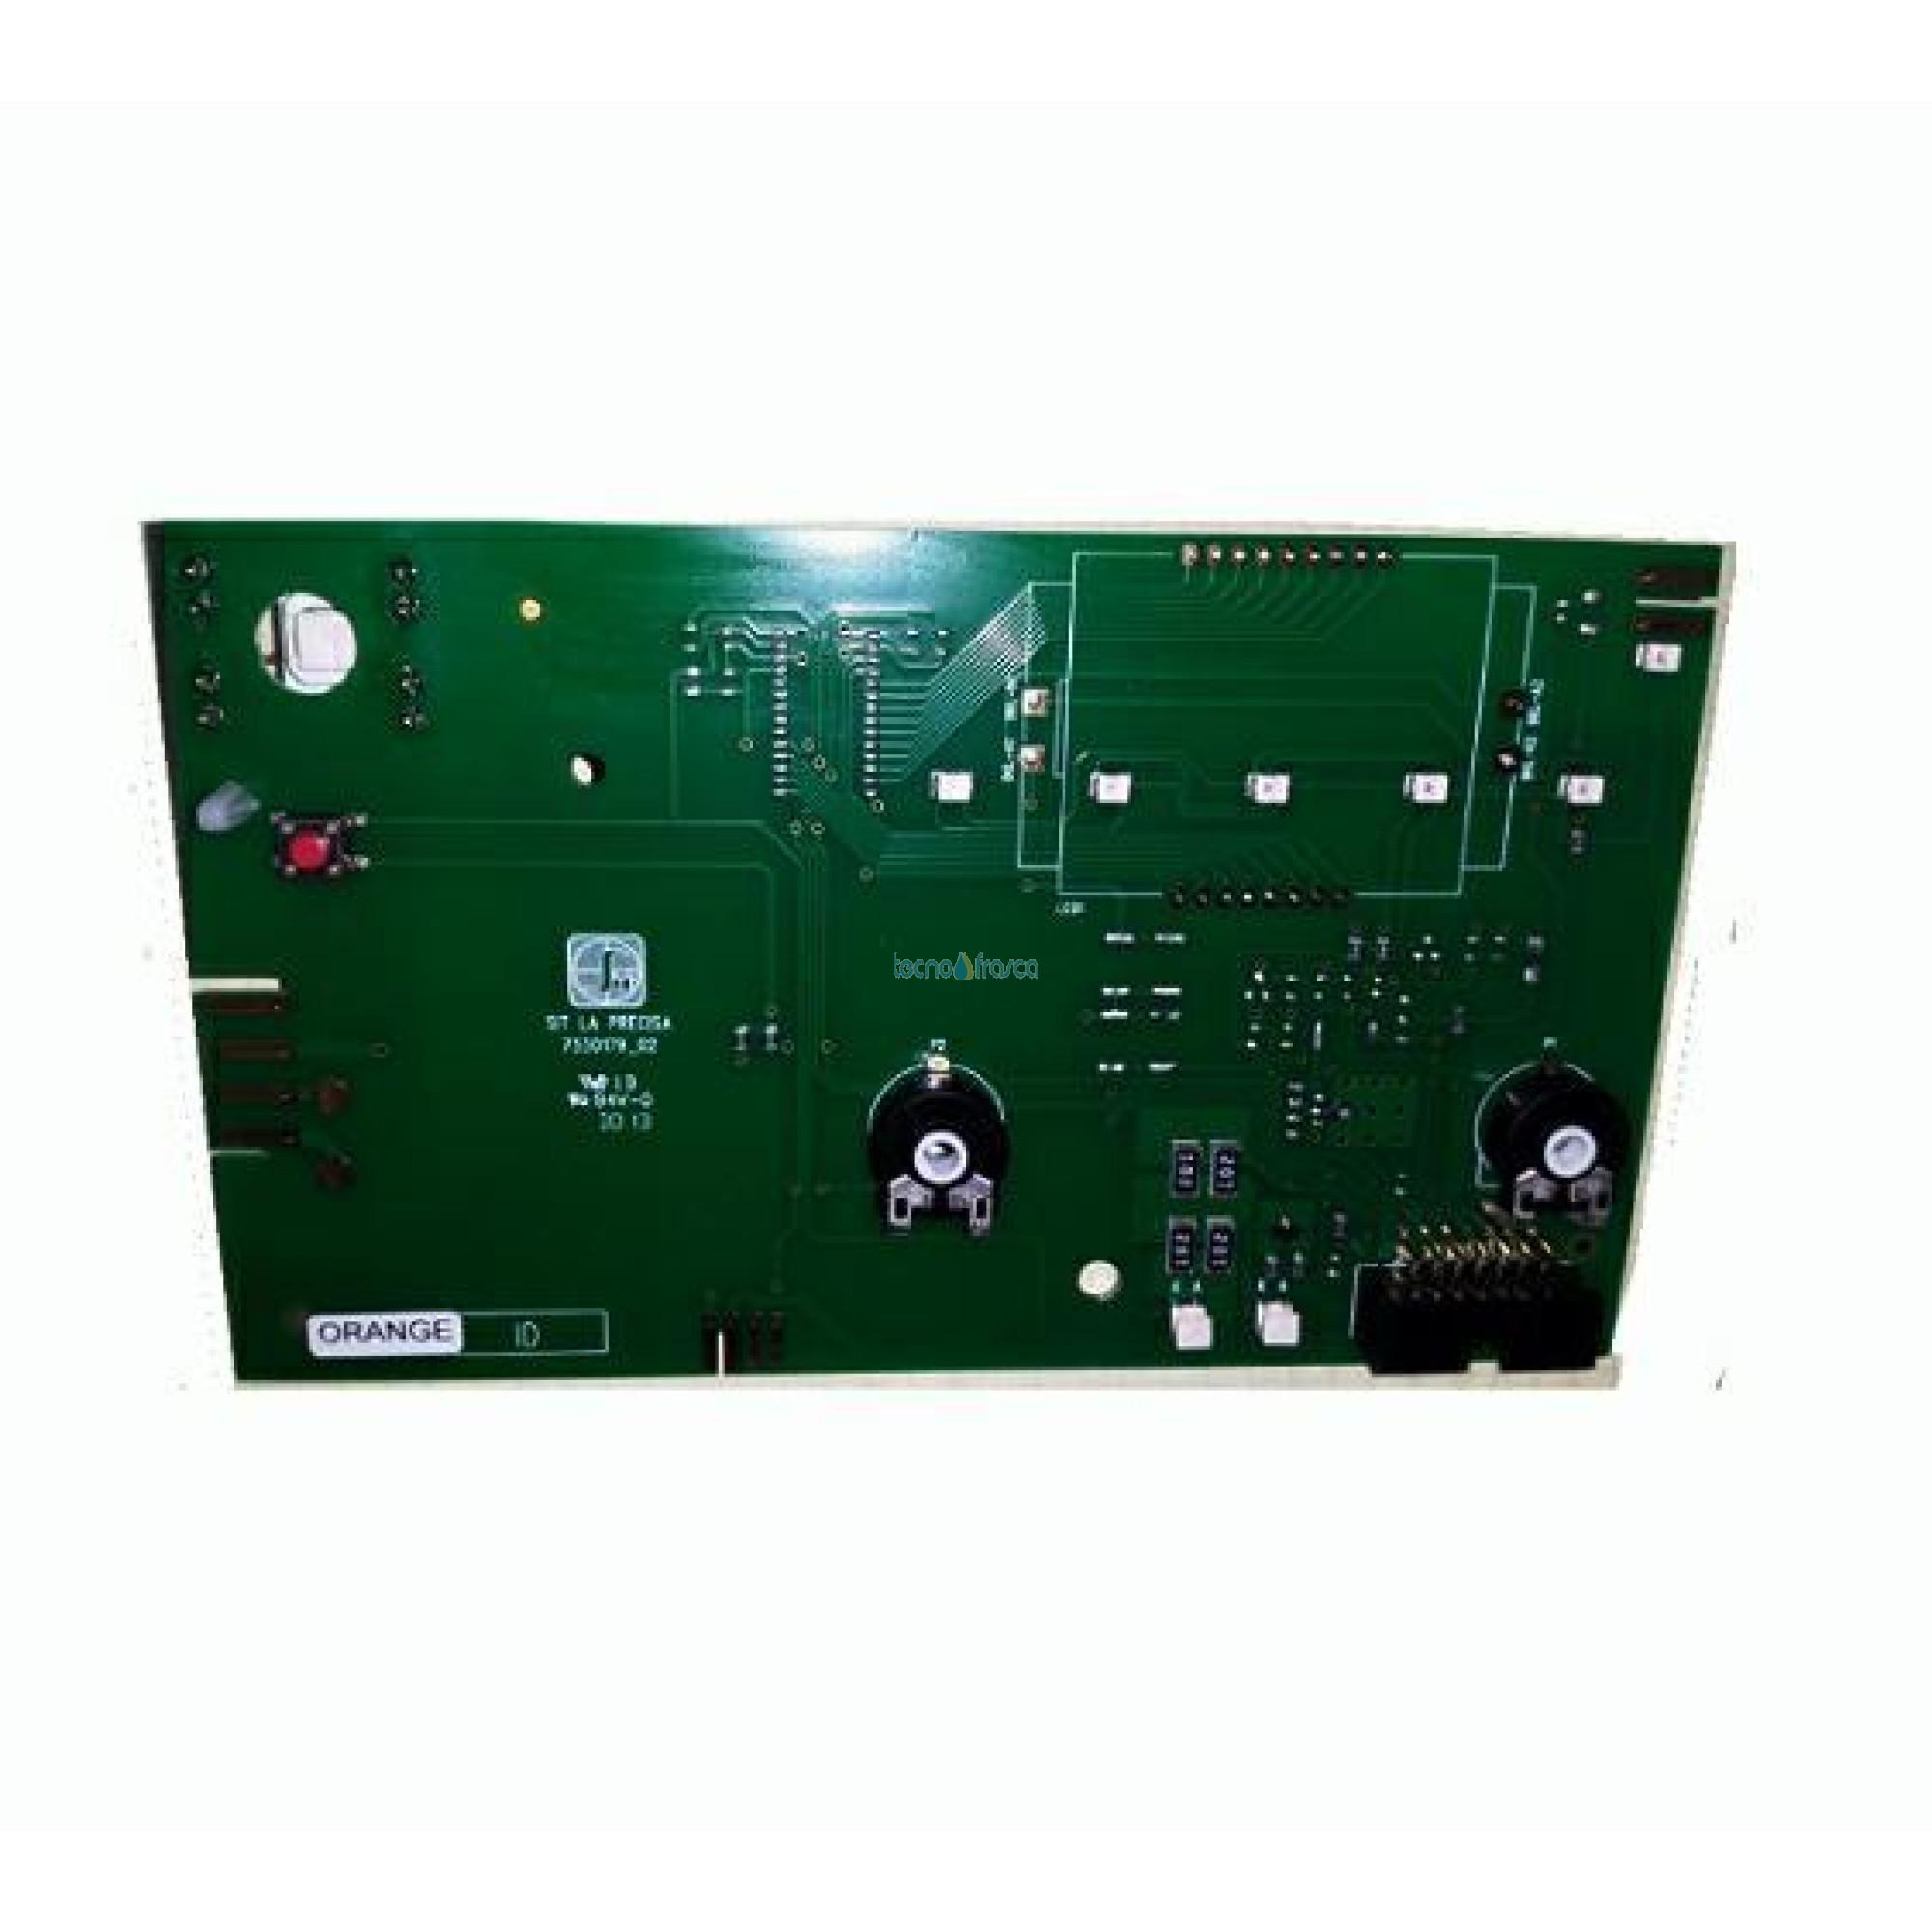 Junkers bosch scheda elettronica 8716012205